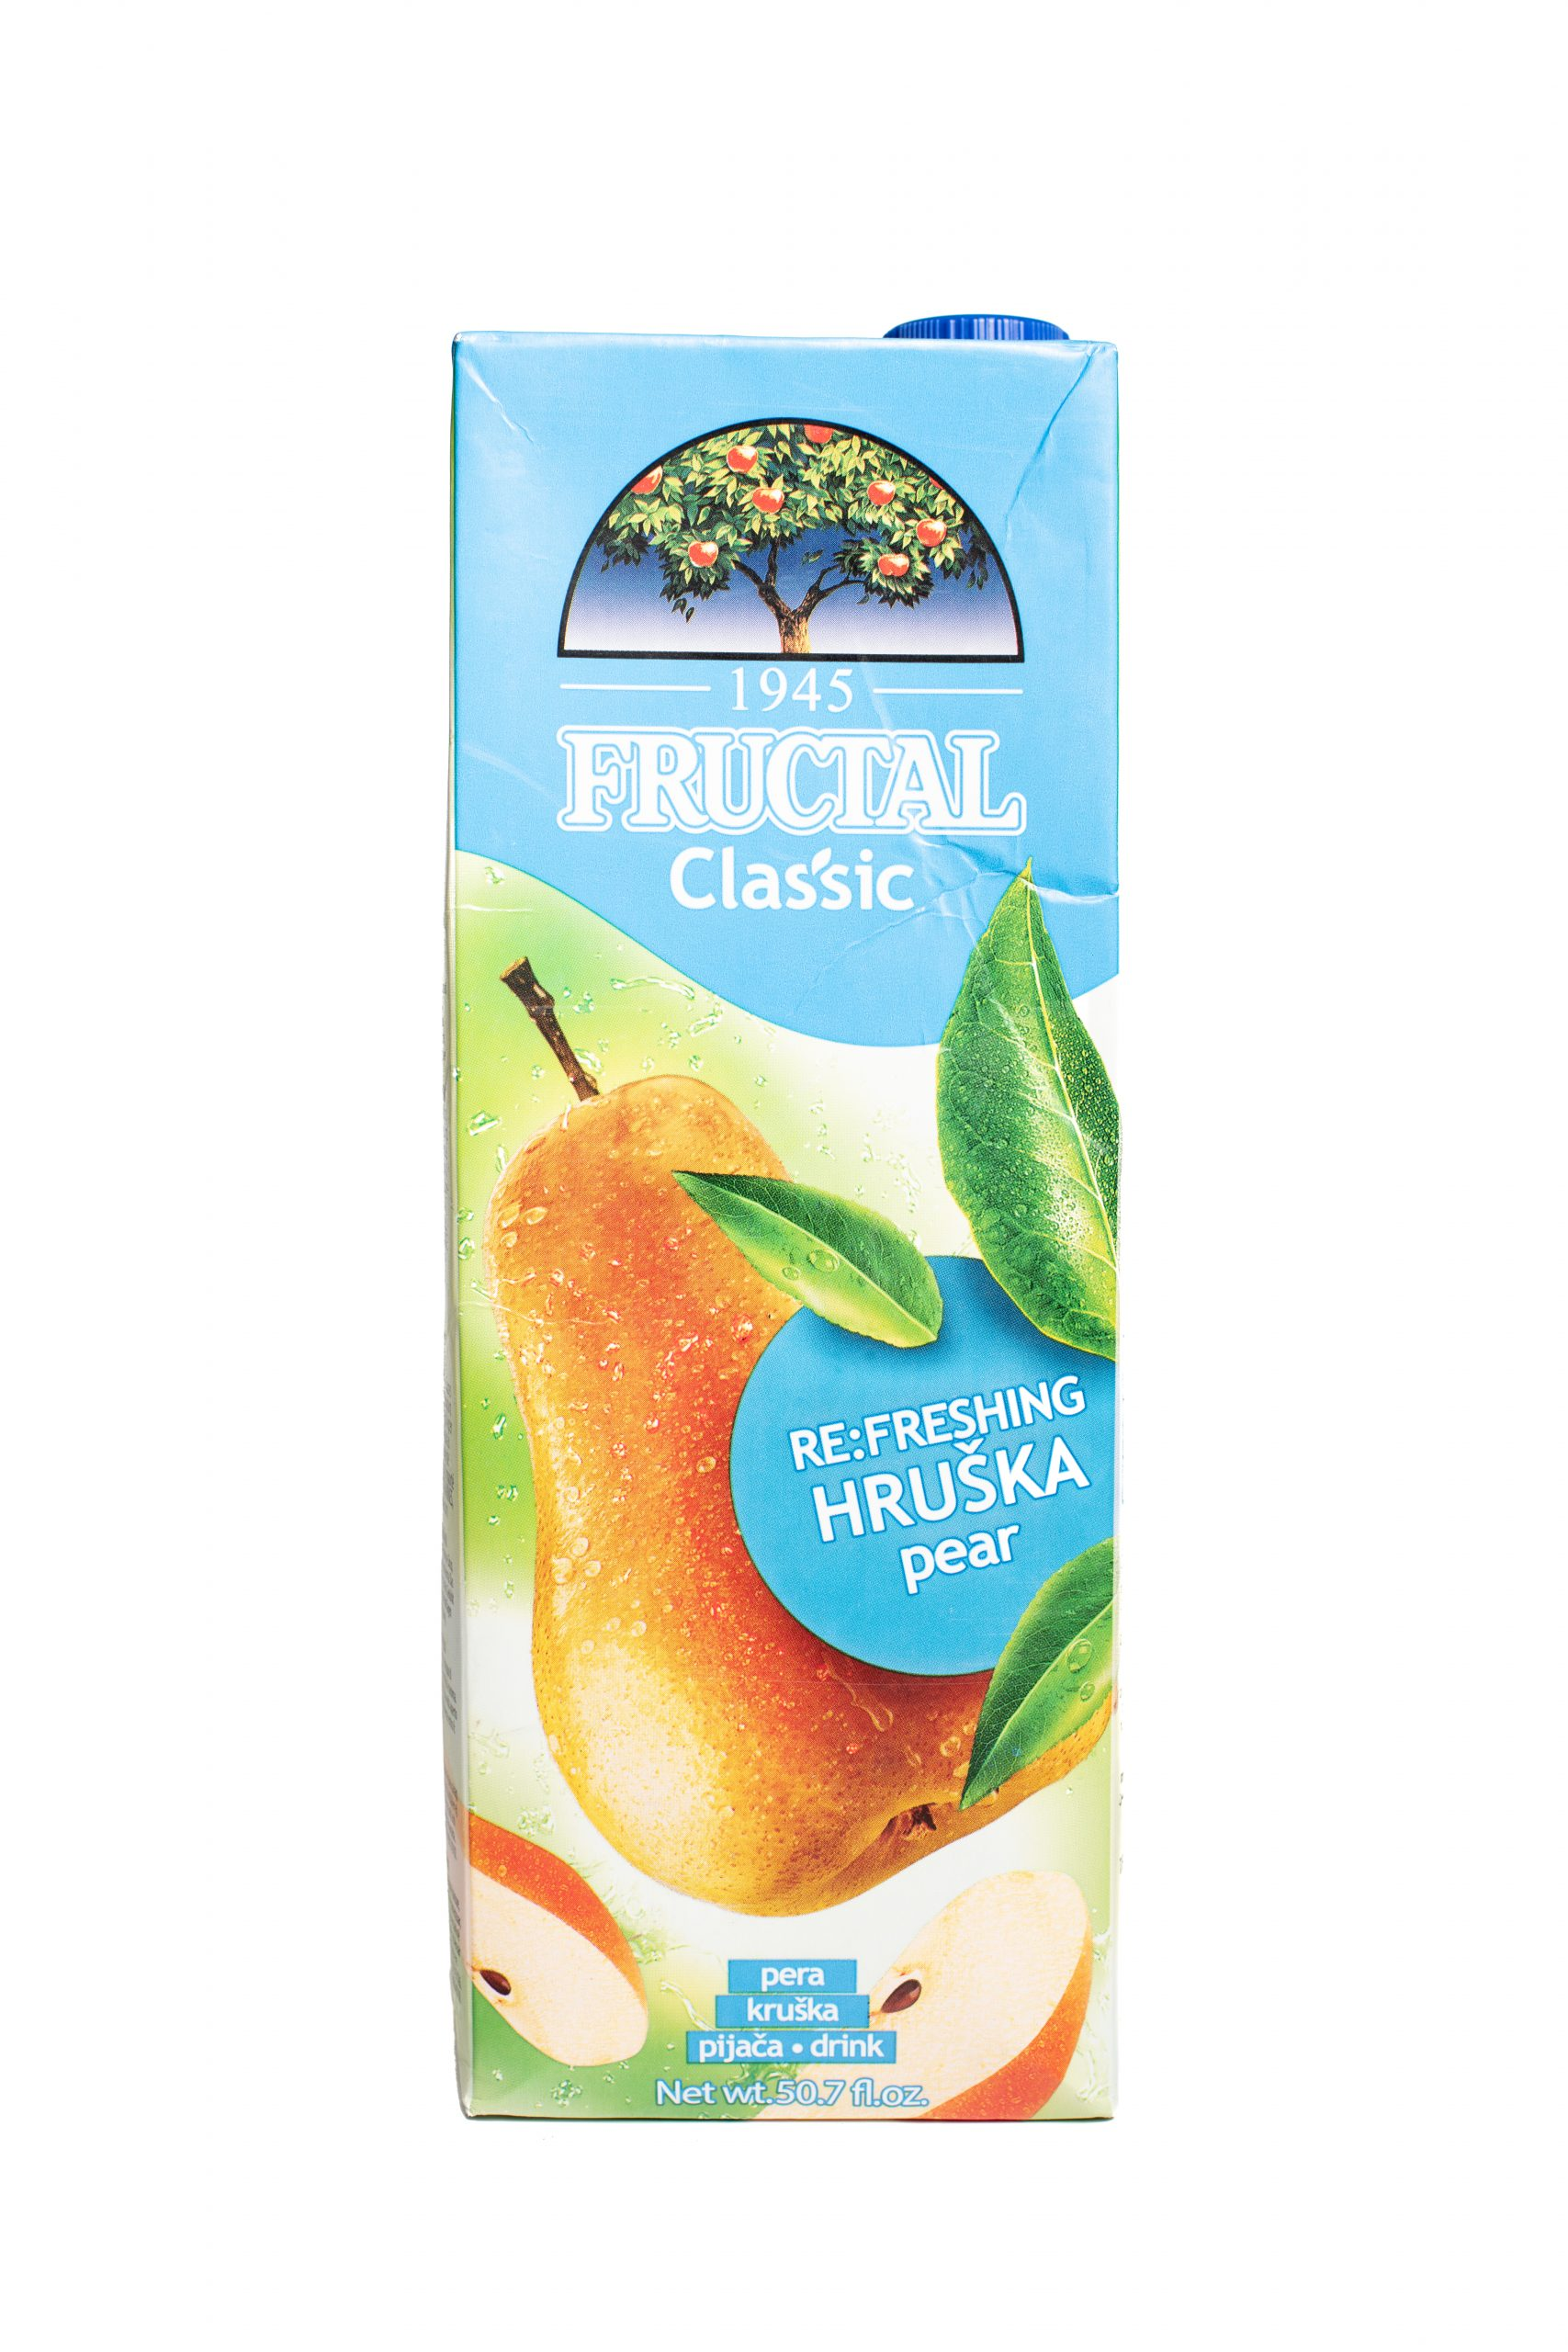 Fructal Classic | 1.5 L | Pear